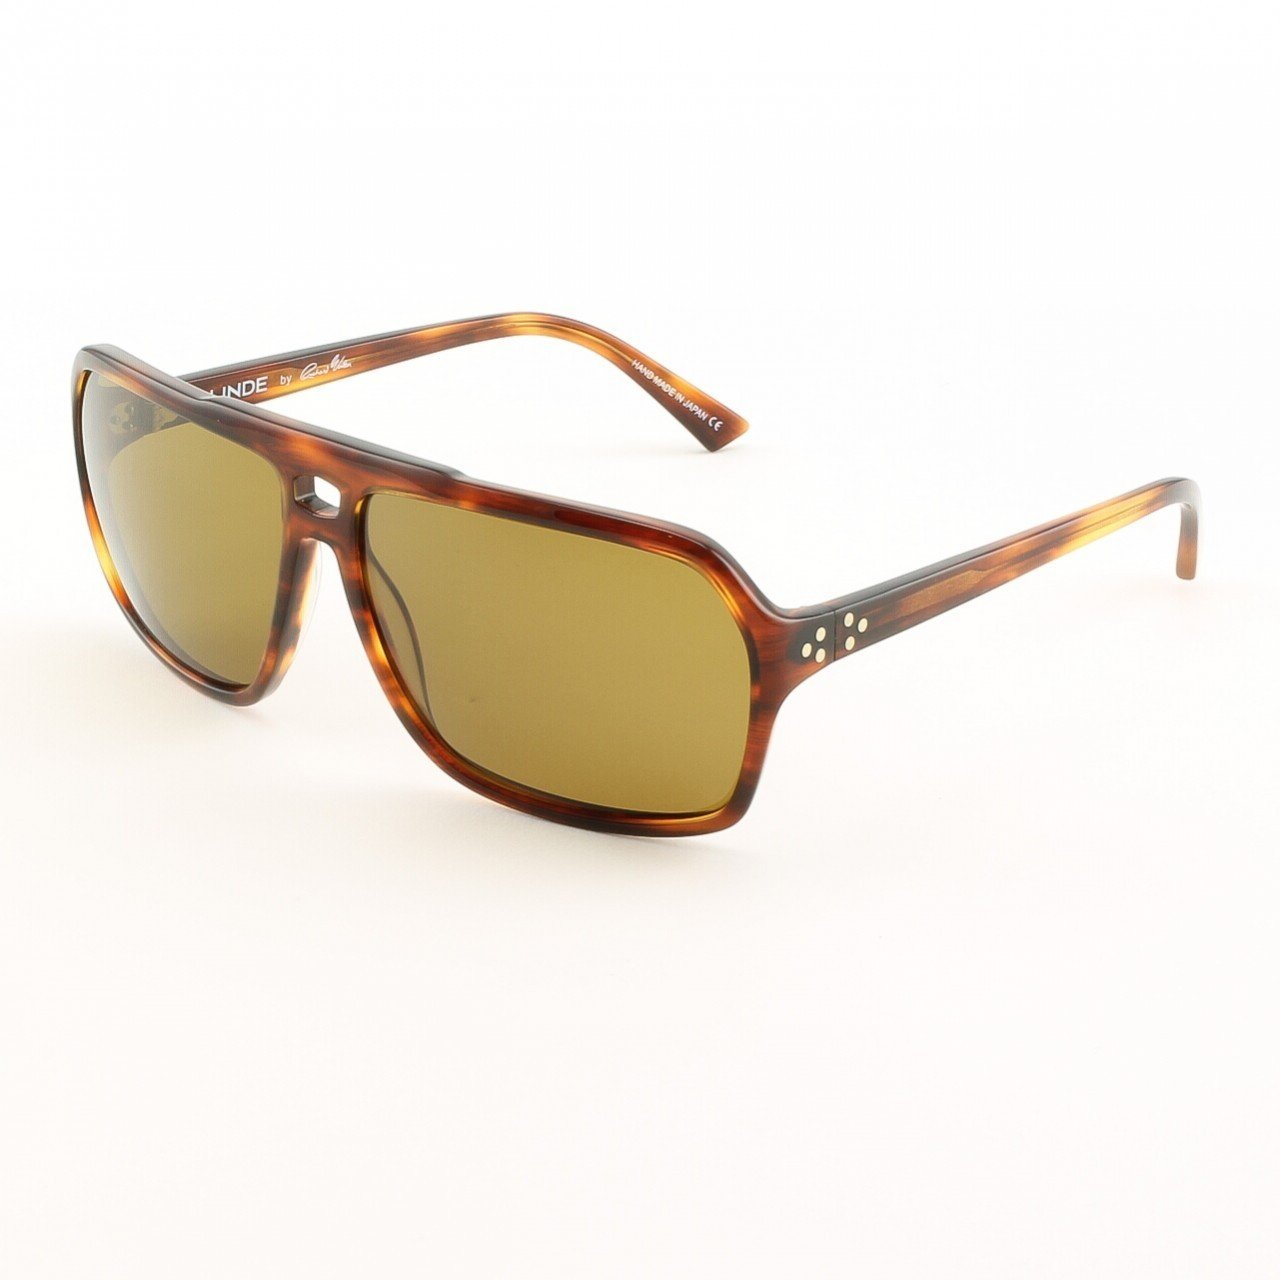 Blinde Mine All Mine Women's Sunglasses Col. Tortoise with Brown Lenses